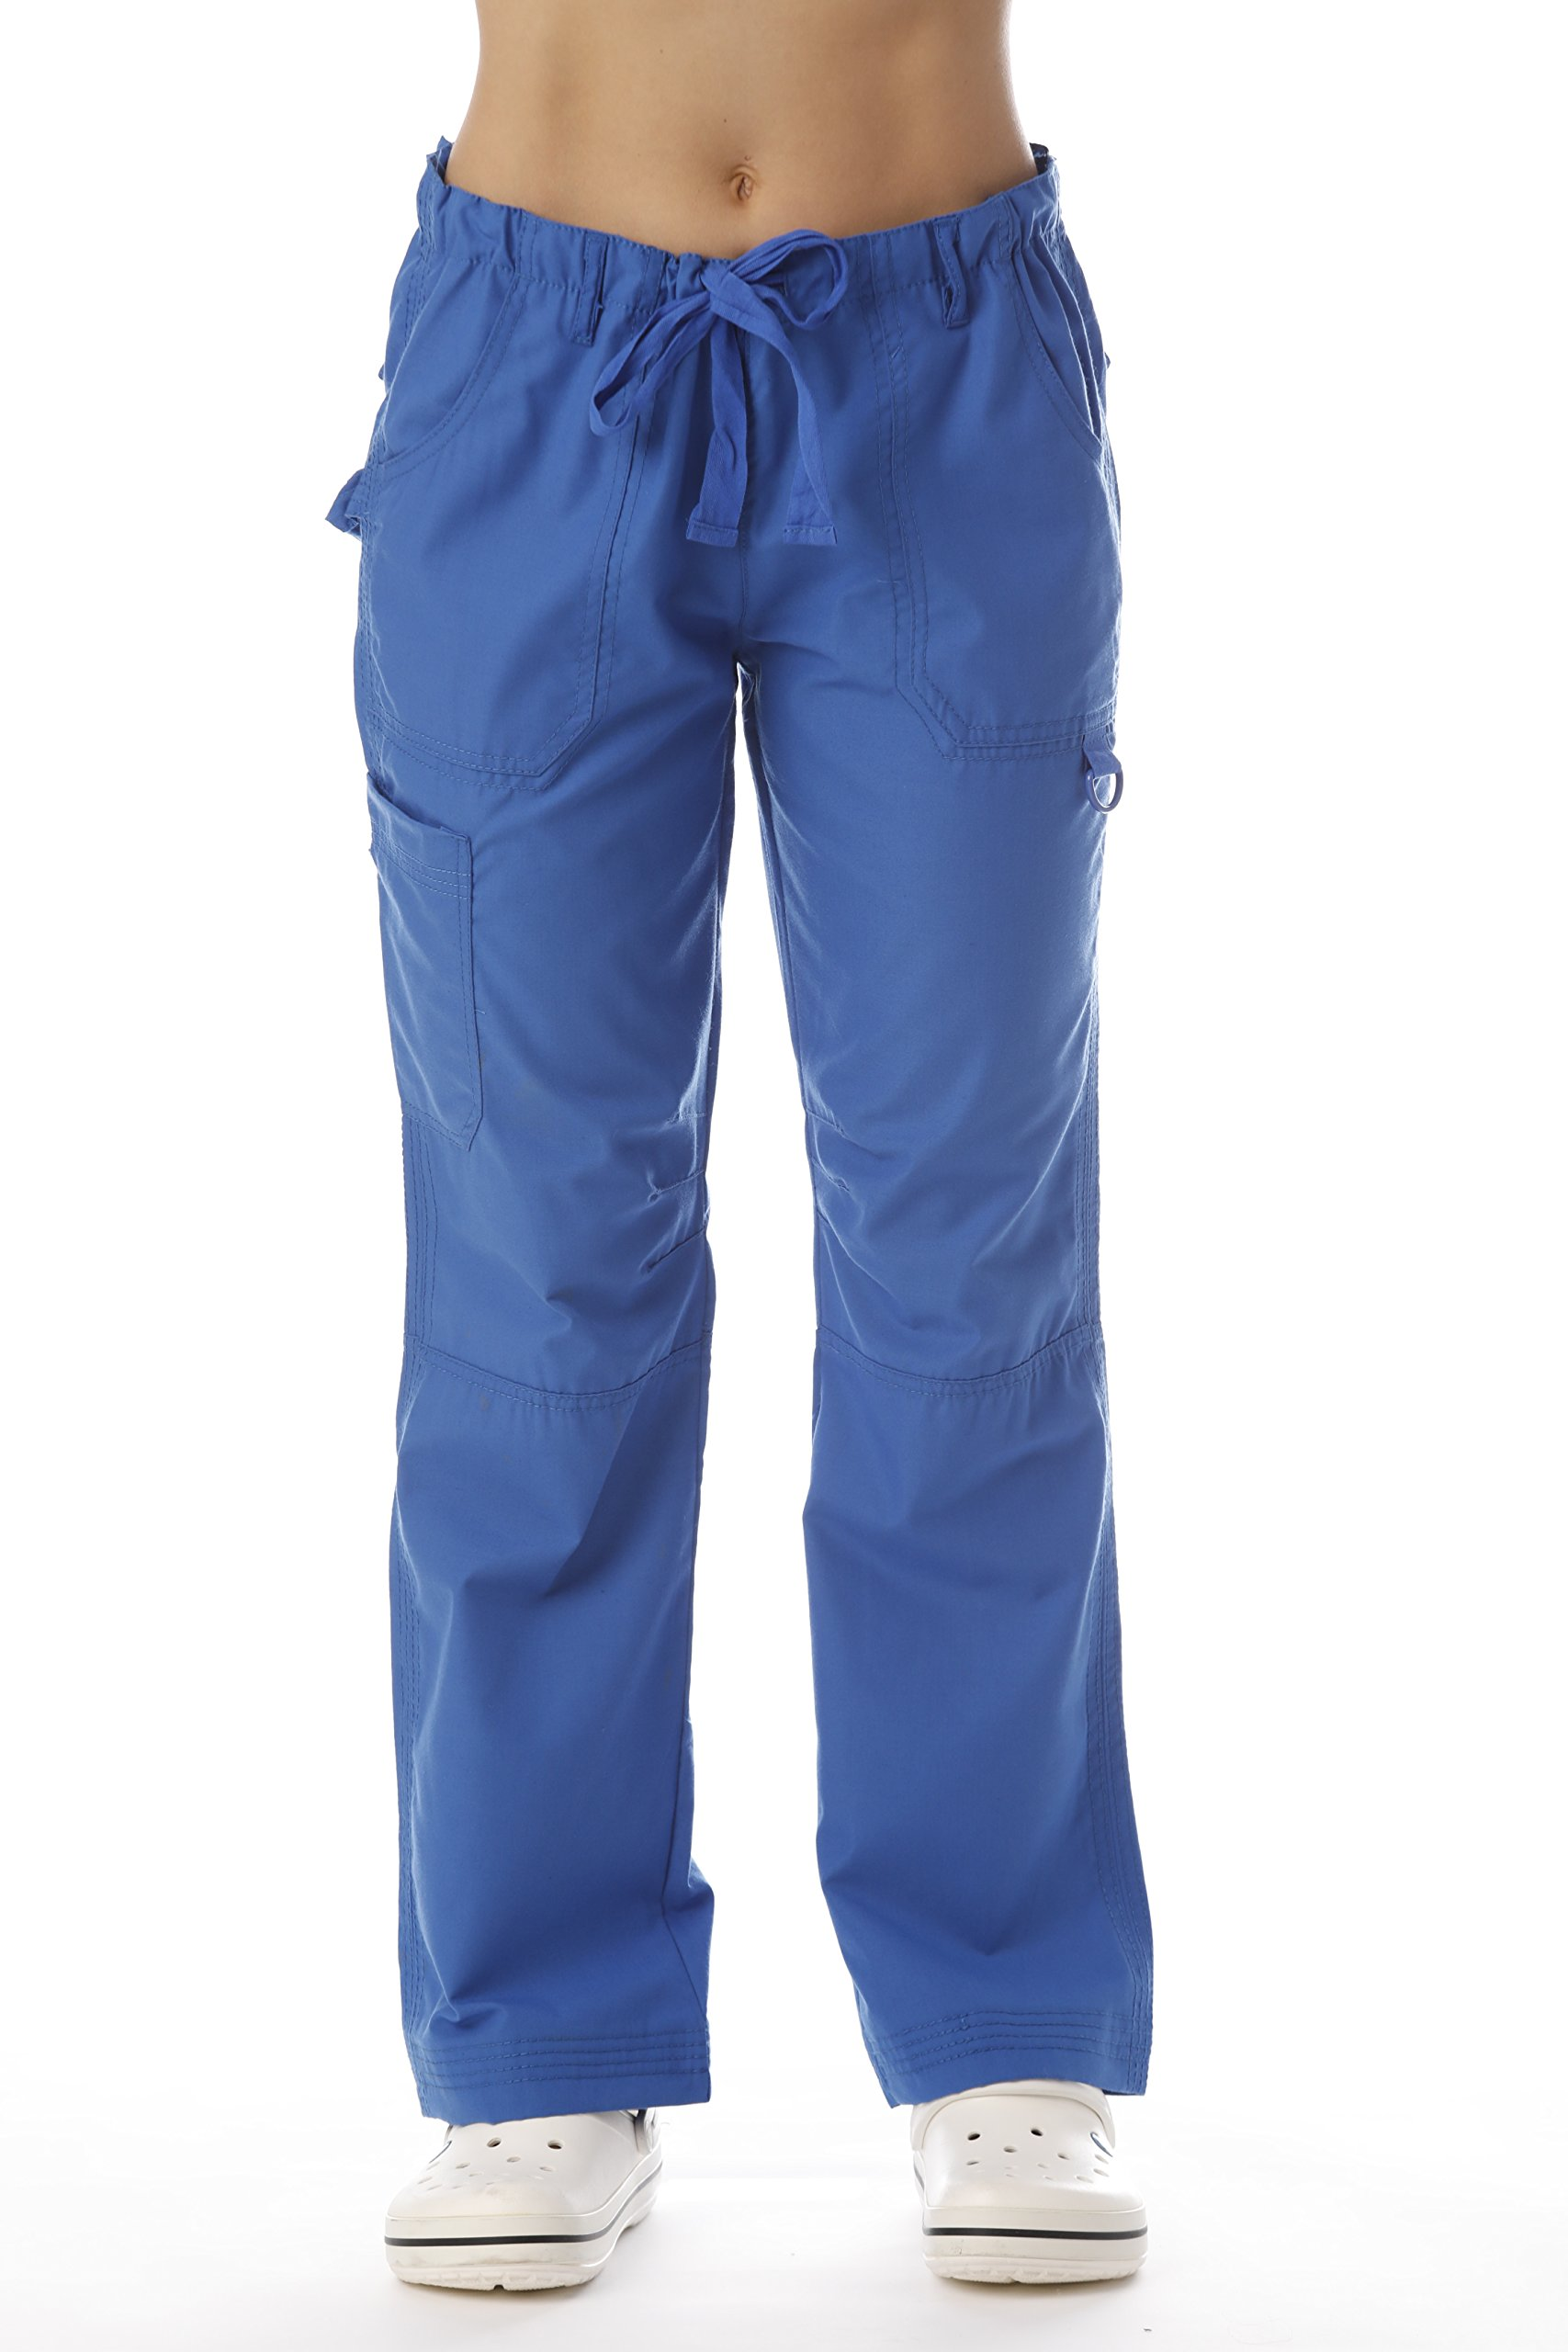 Just Love 24000PROYBLU-XS Women's Utility Scrub Pants Scrubs, Royal Blue Utility, X-Small